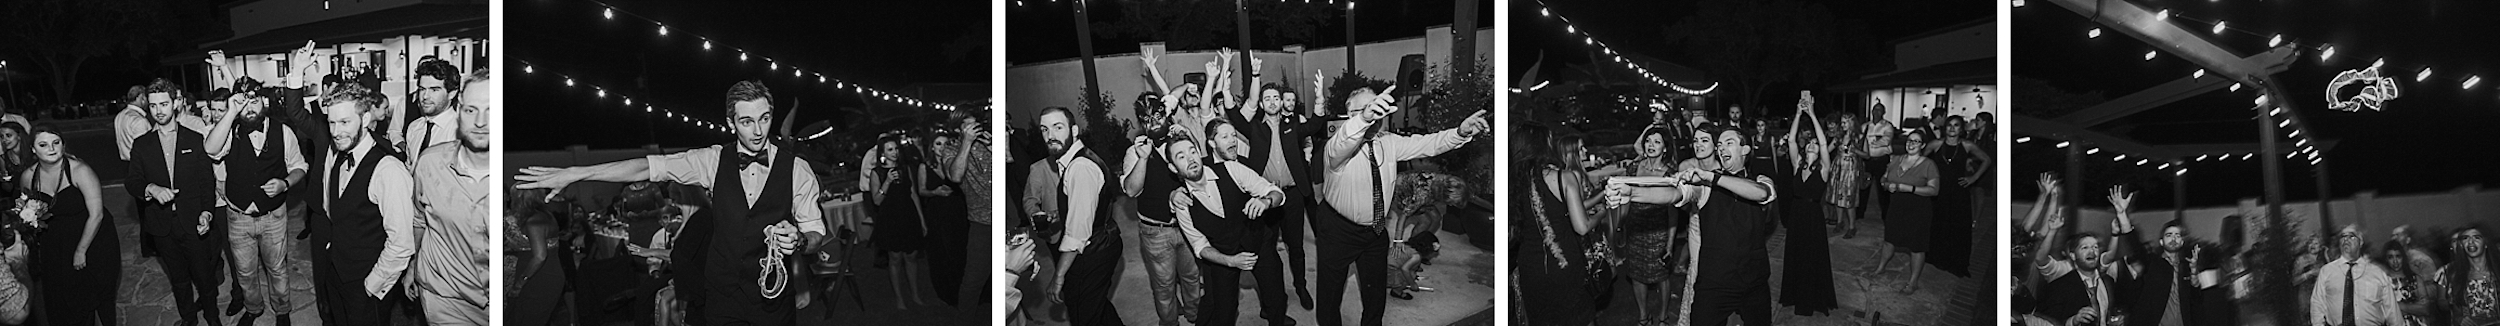 Garden Grove Wedding & Event Center5762.JPG